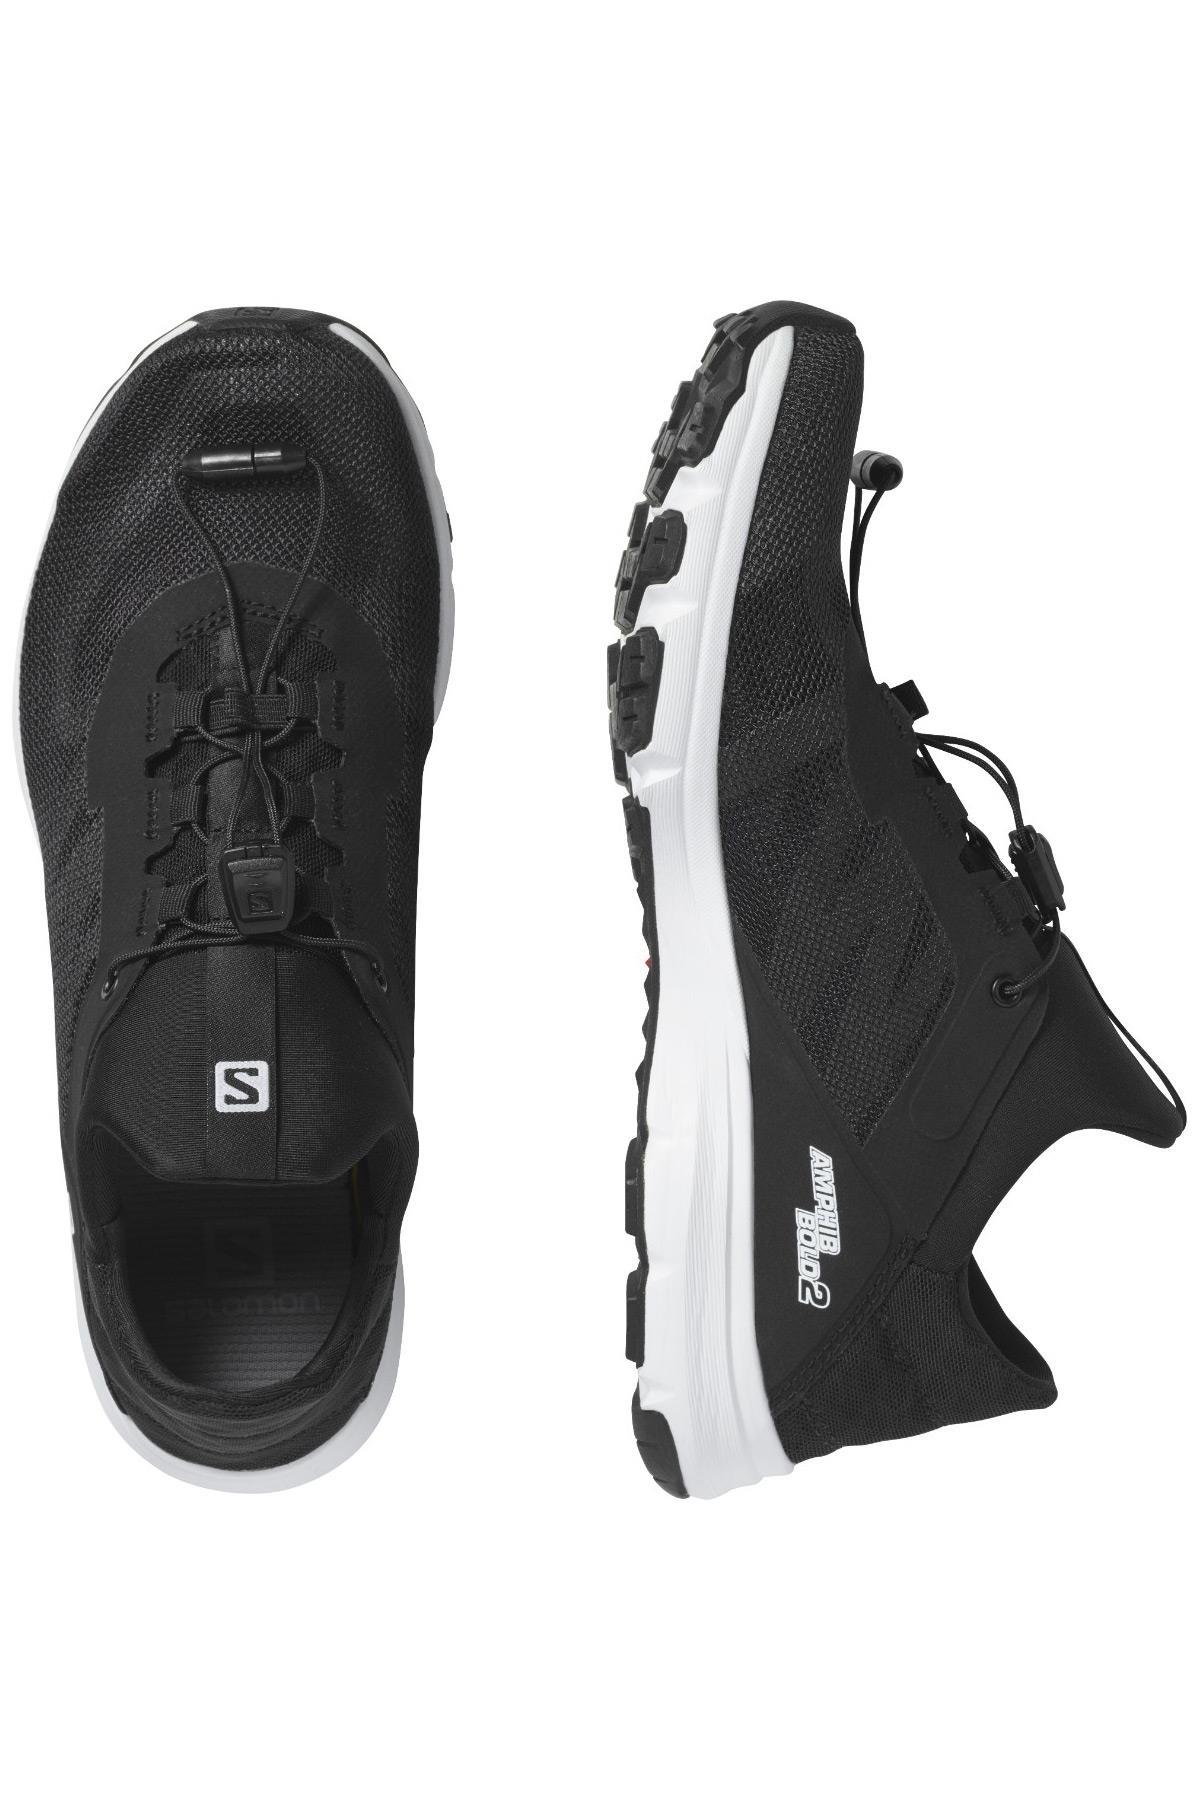 Salomon AMPHIB BOLD 2 W Bayan Ayakkabısı L41304200